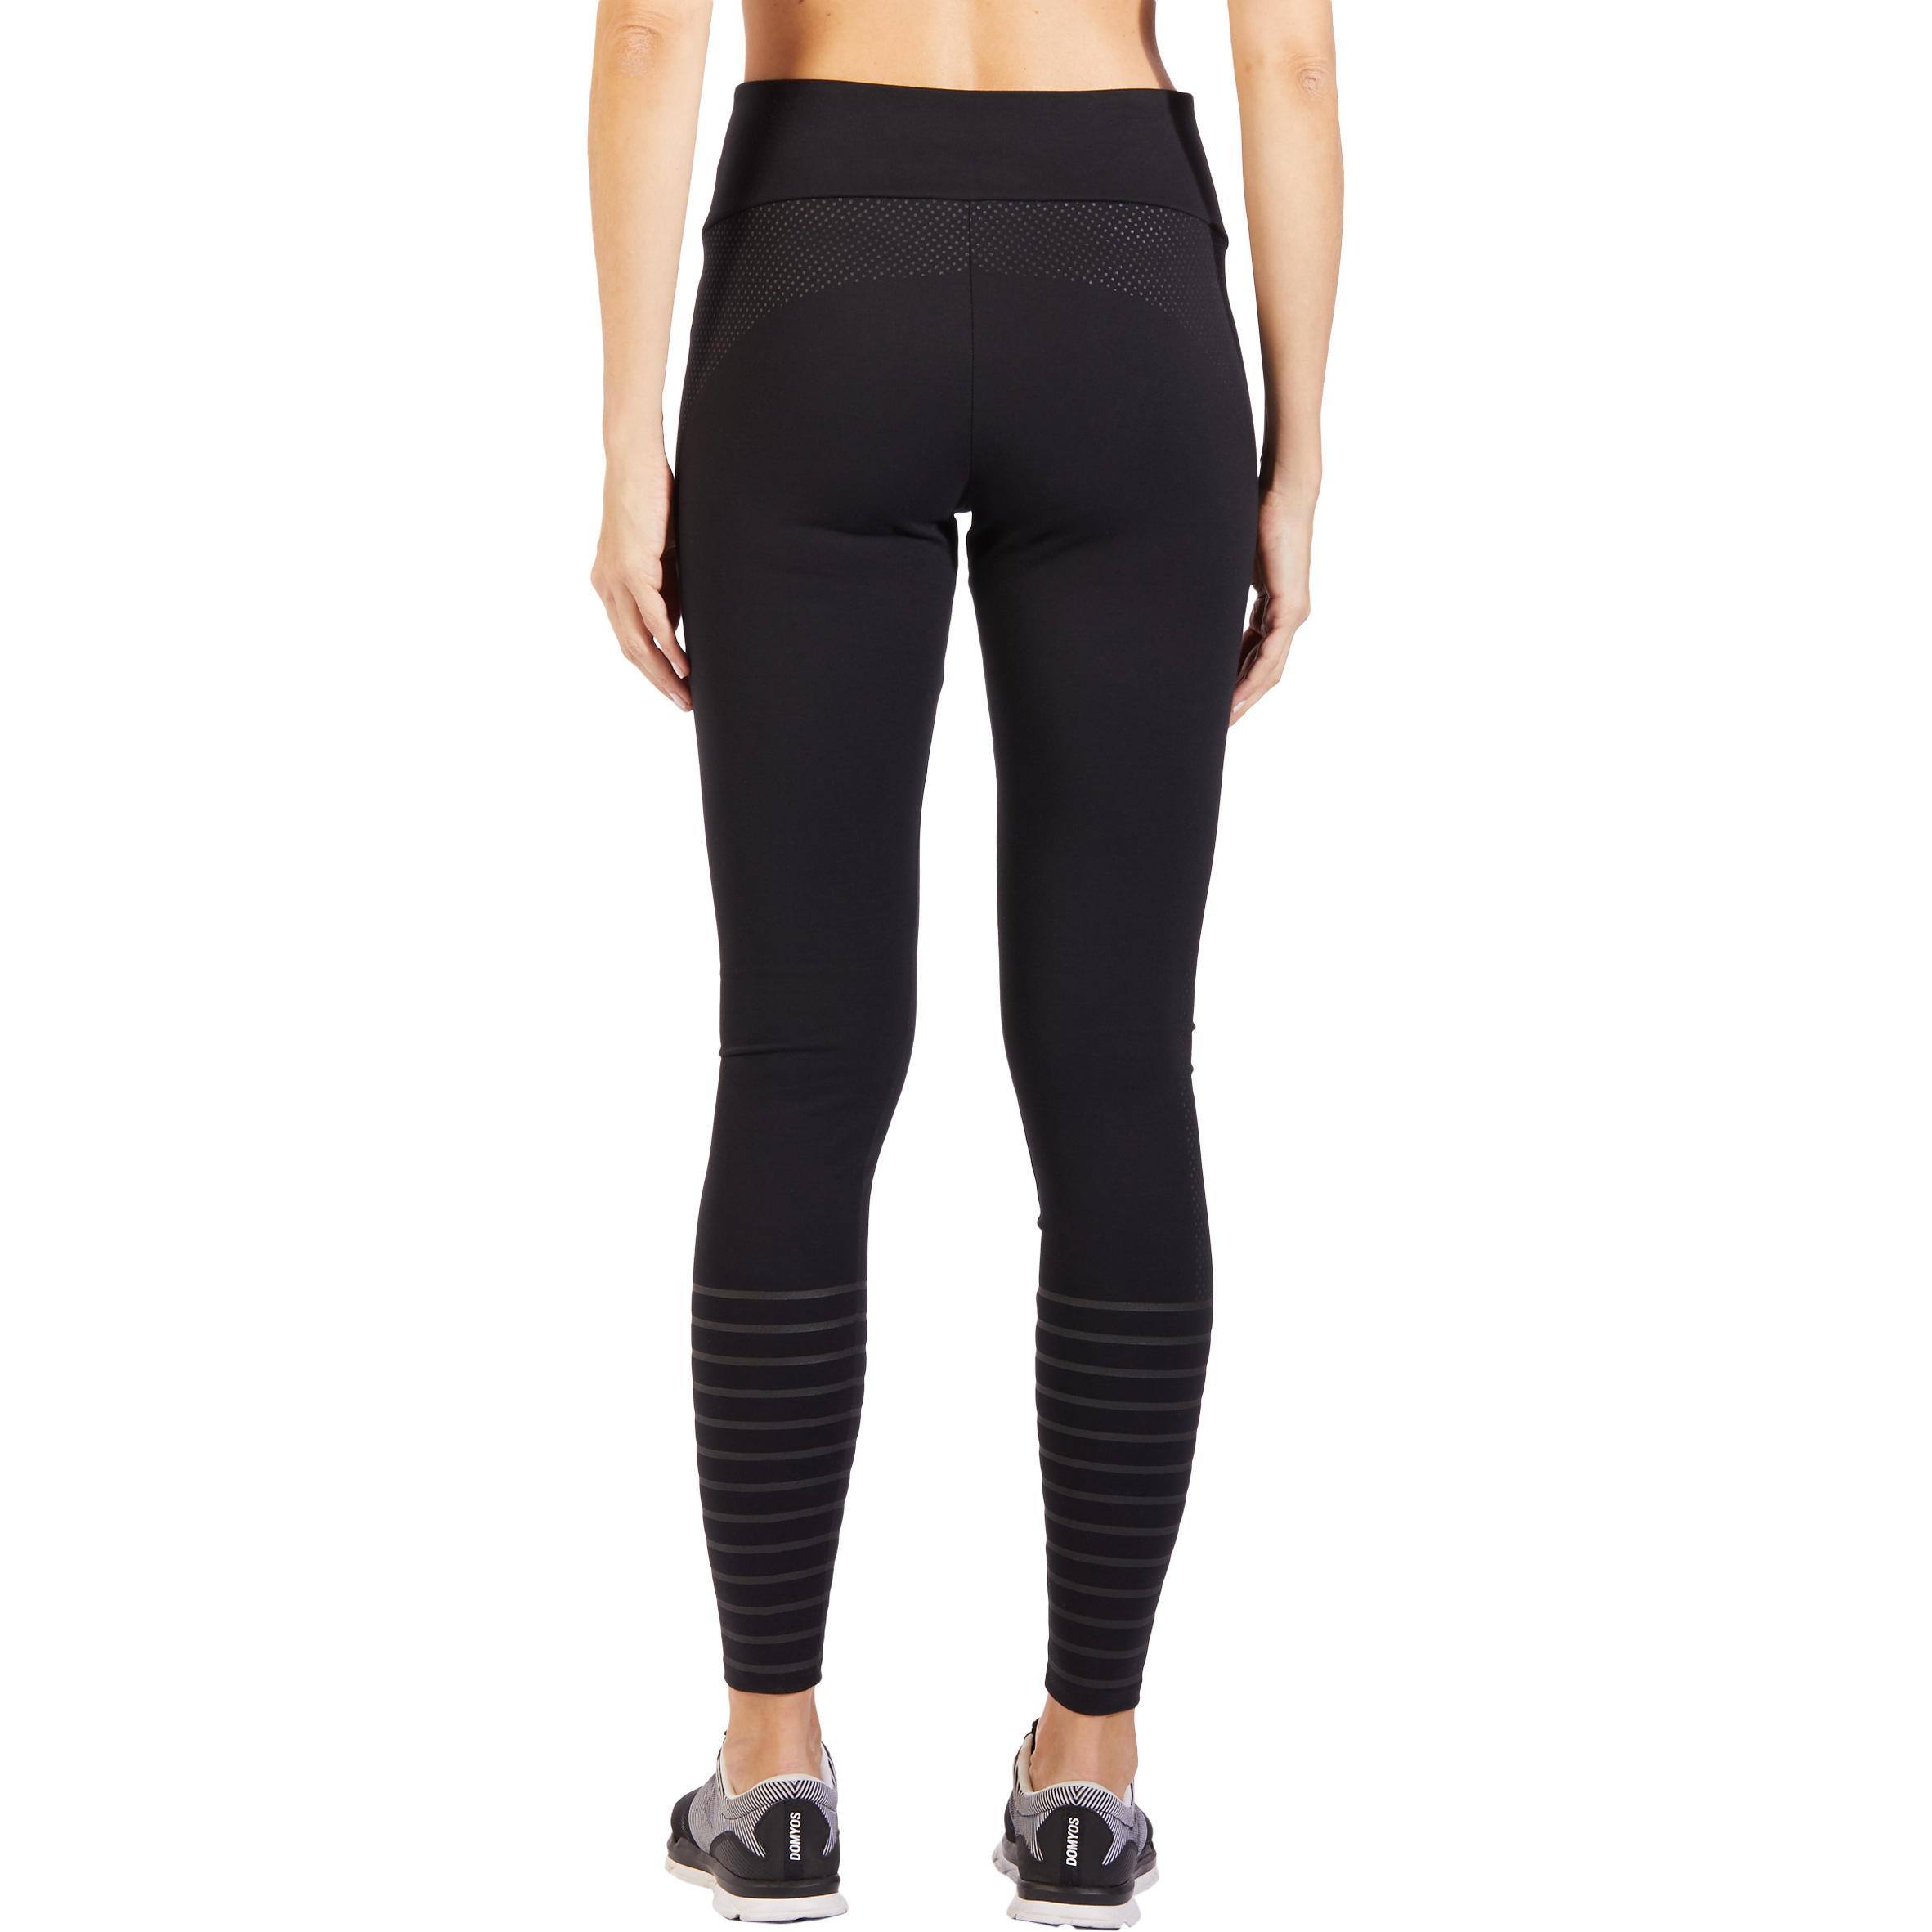 900 Women's Slim-Fit Gym & Pilates Leggings - Black